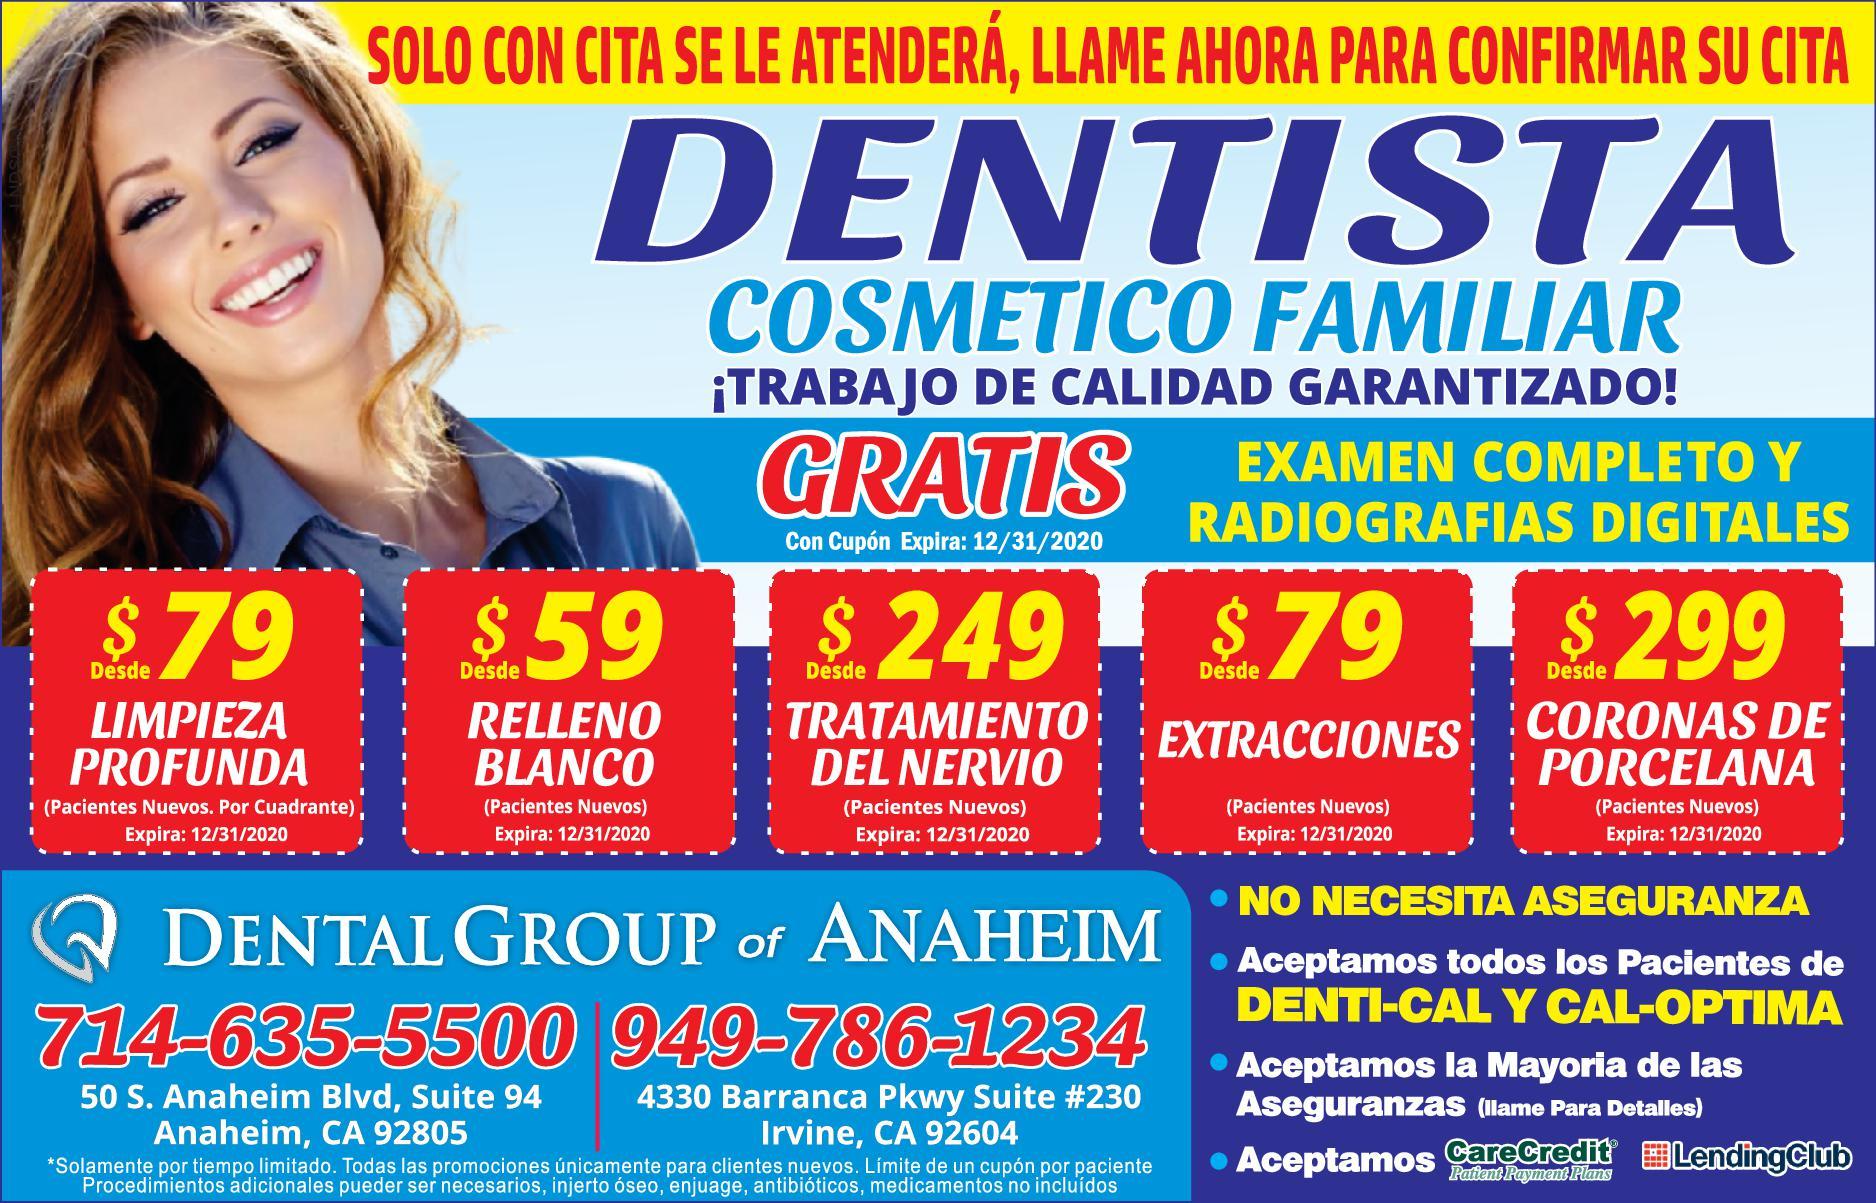 Dental Group Of Anaheim